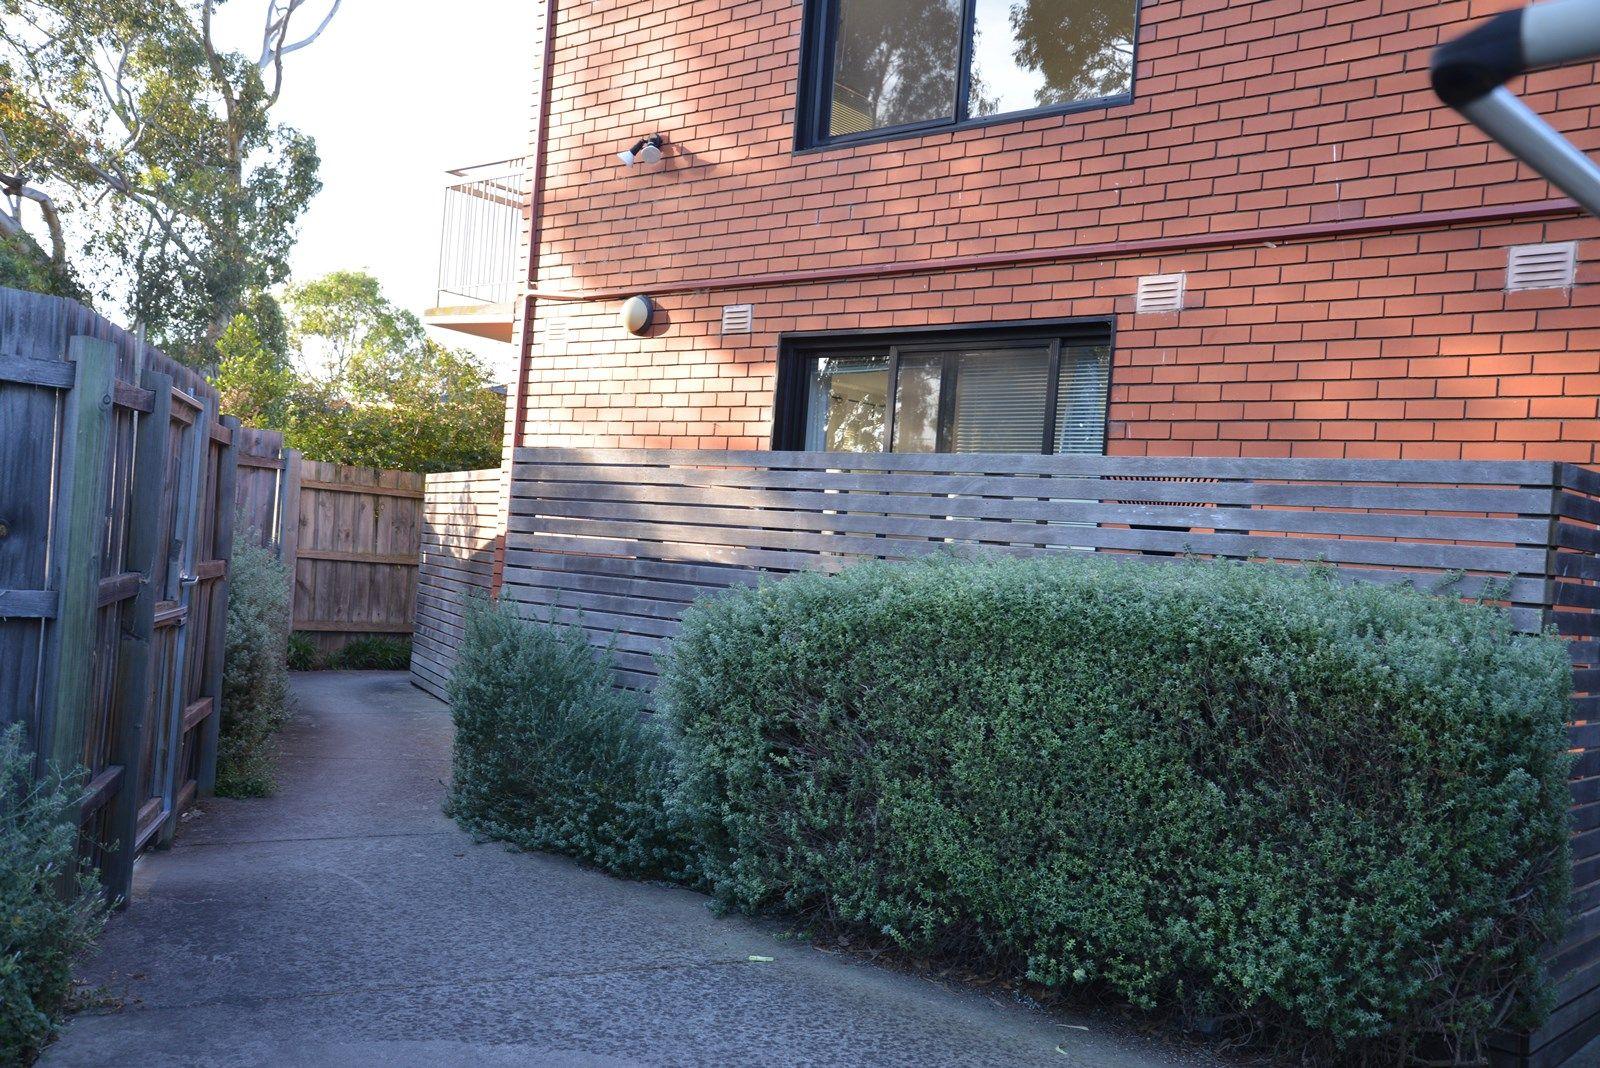 2/92 Glen Huntly Road, Elwood VIC 3184, Image 1